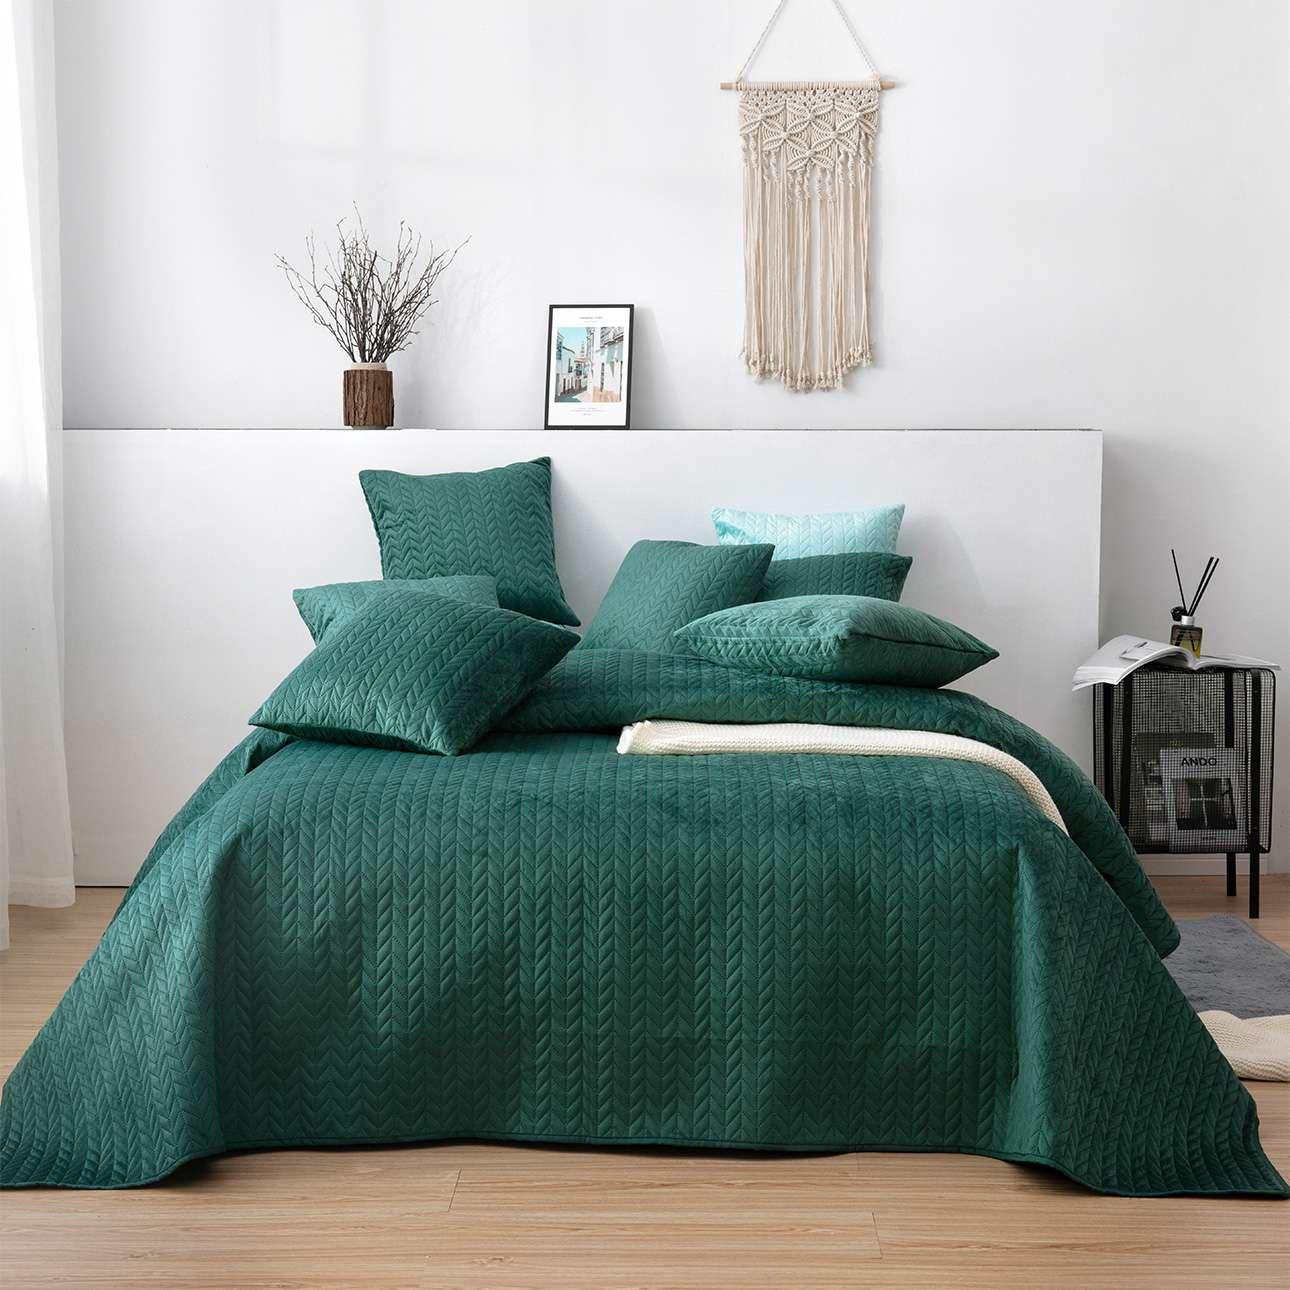 Narzuta na łóżko Silky Chic 220x240cm deep green